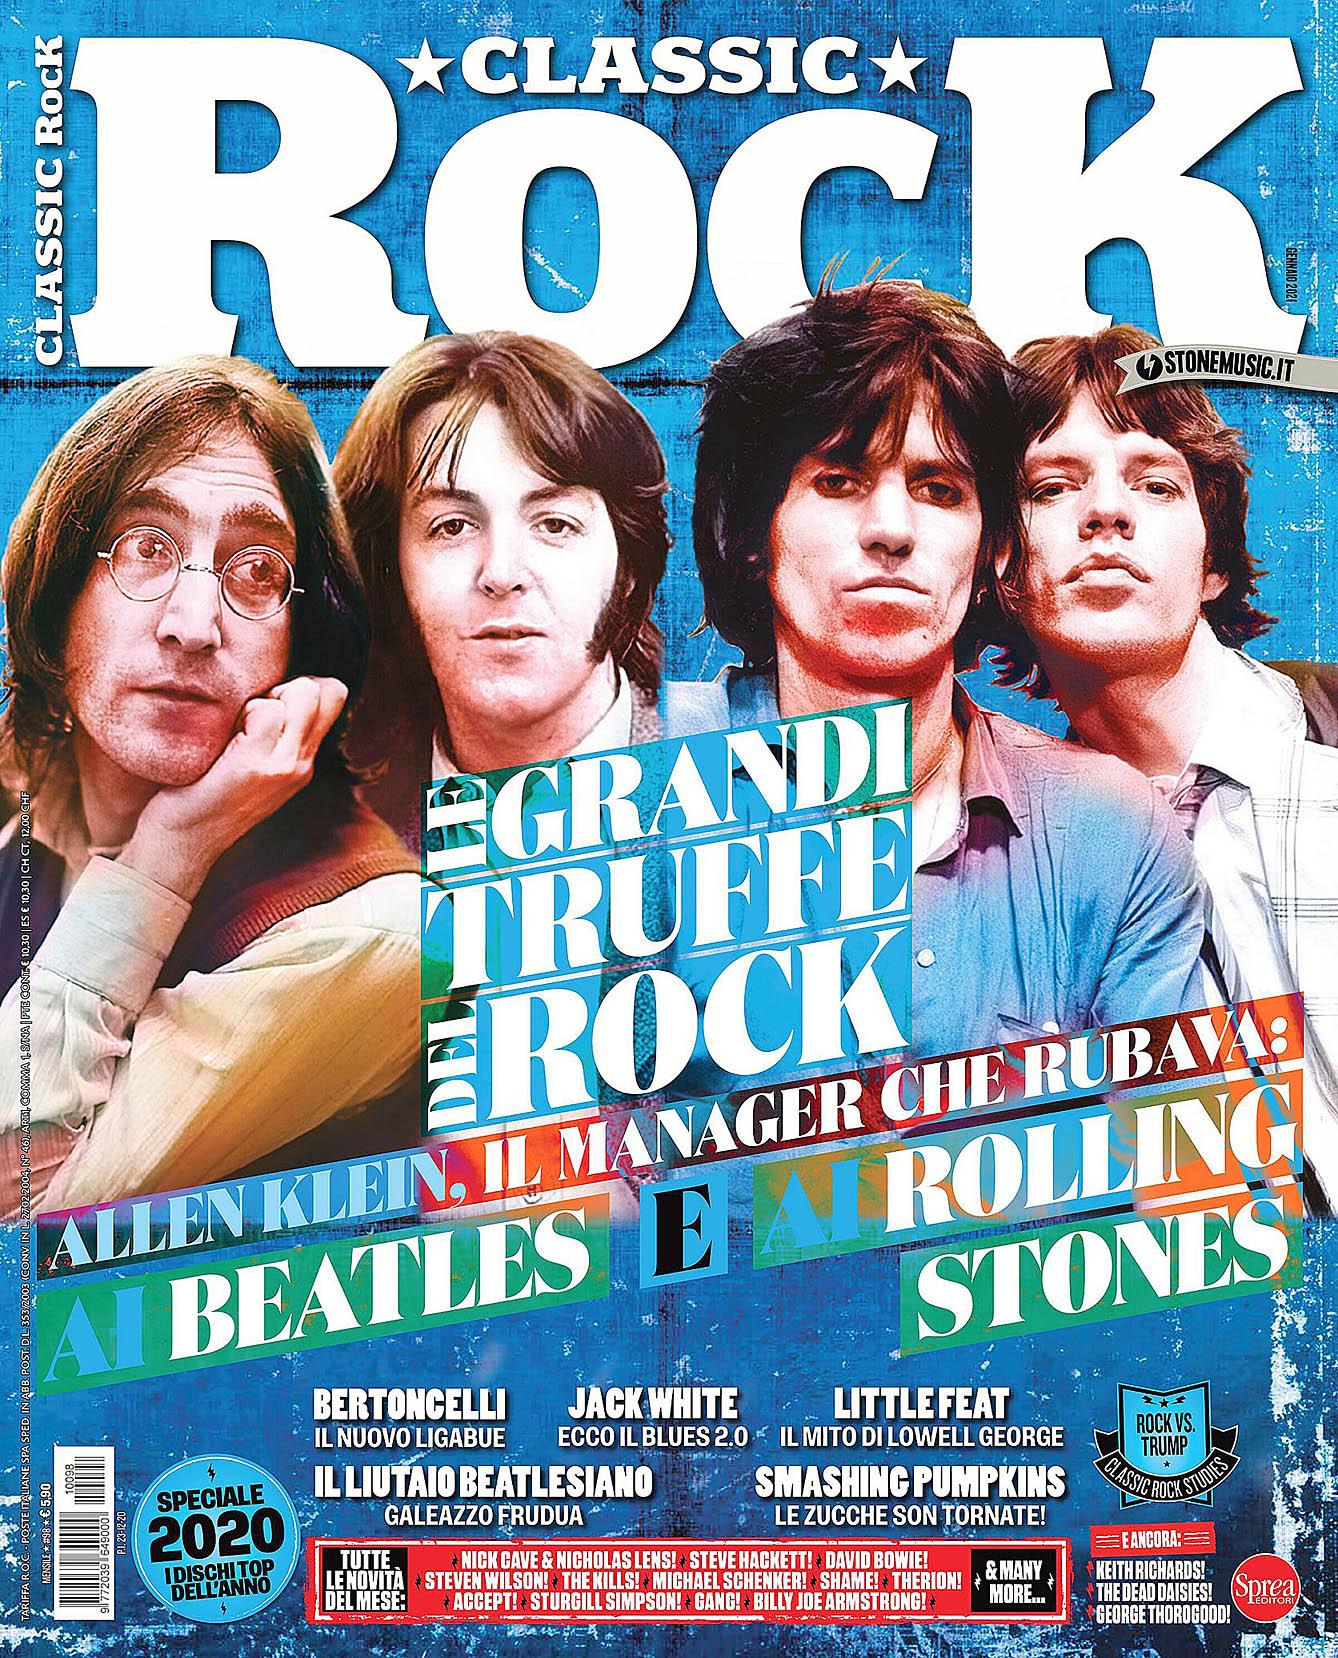 Classic Rock It 2021-01 Beatles 01.jpg